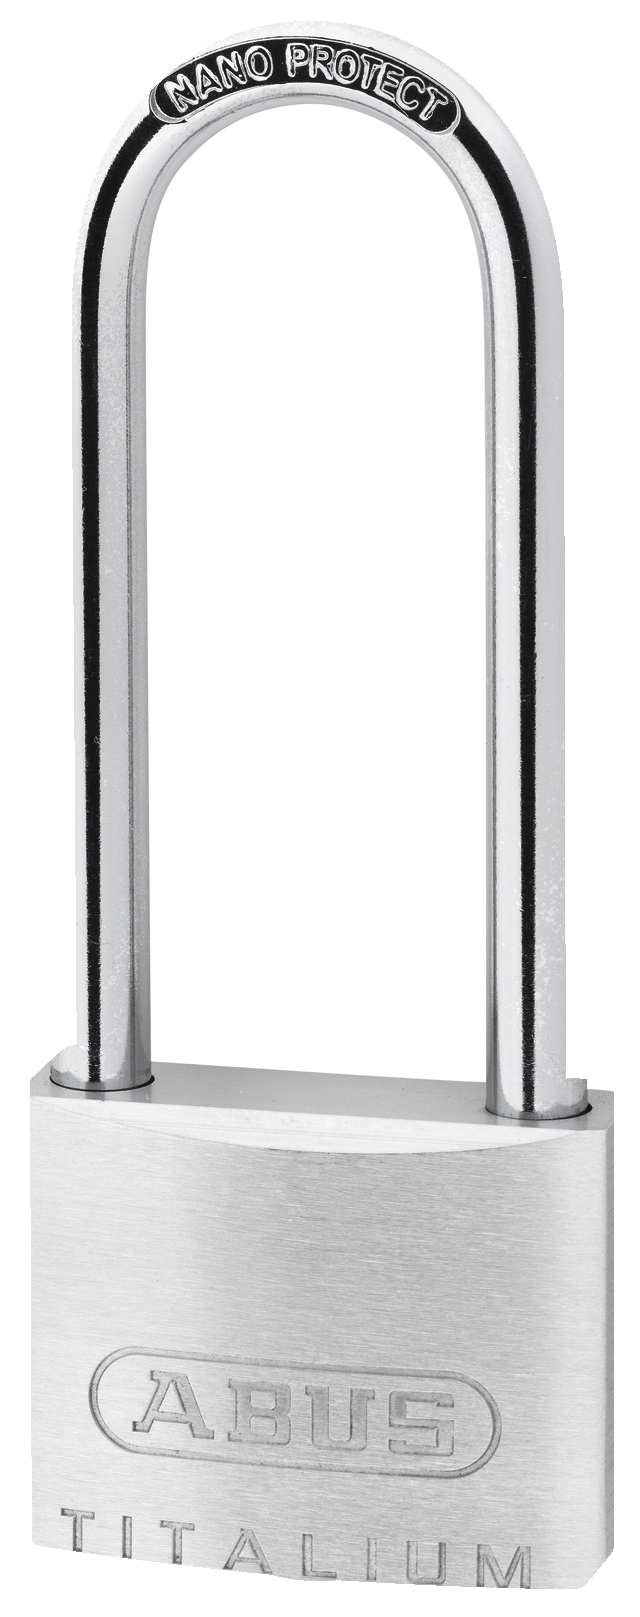 Vorhangschloss 64TI/40HB63 Lock-Tag